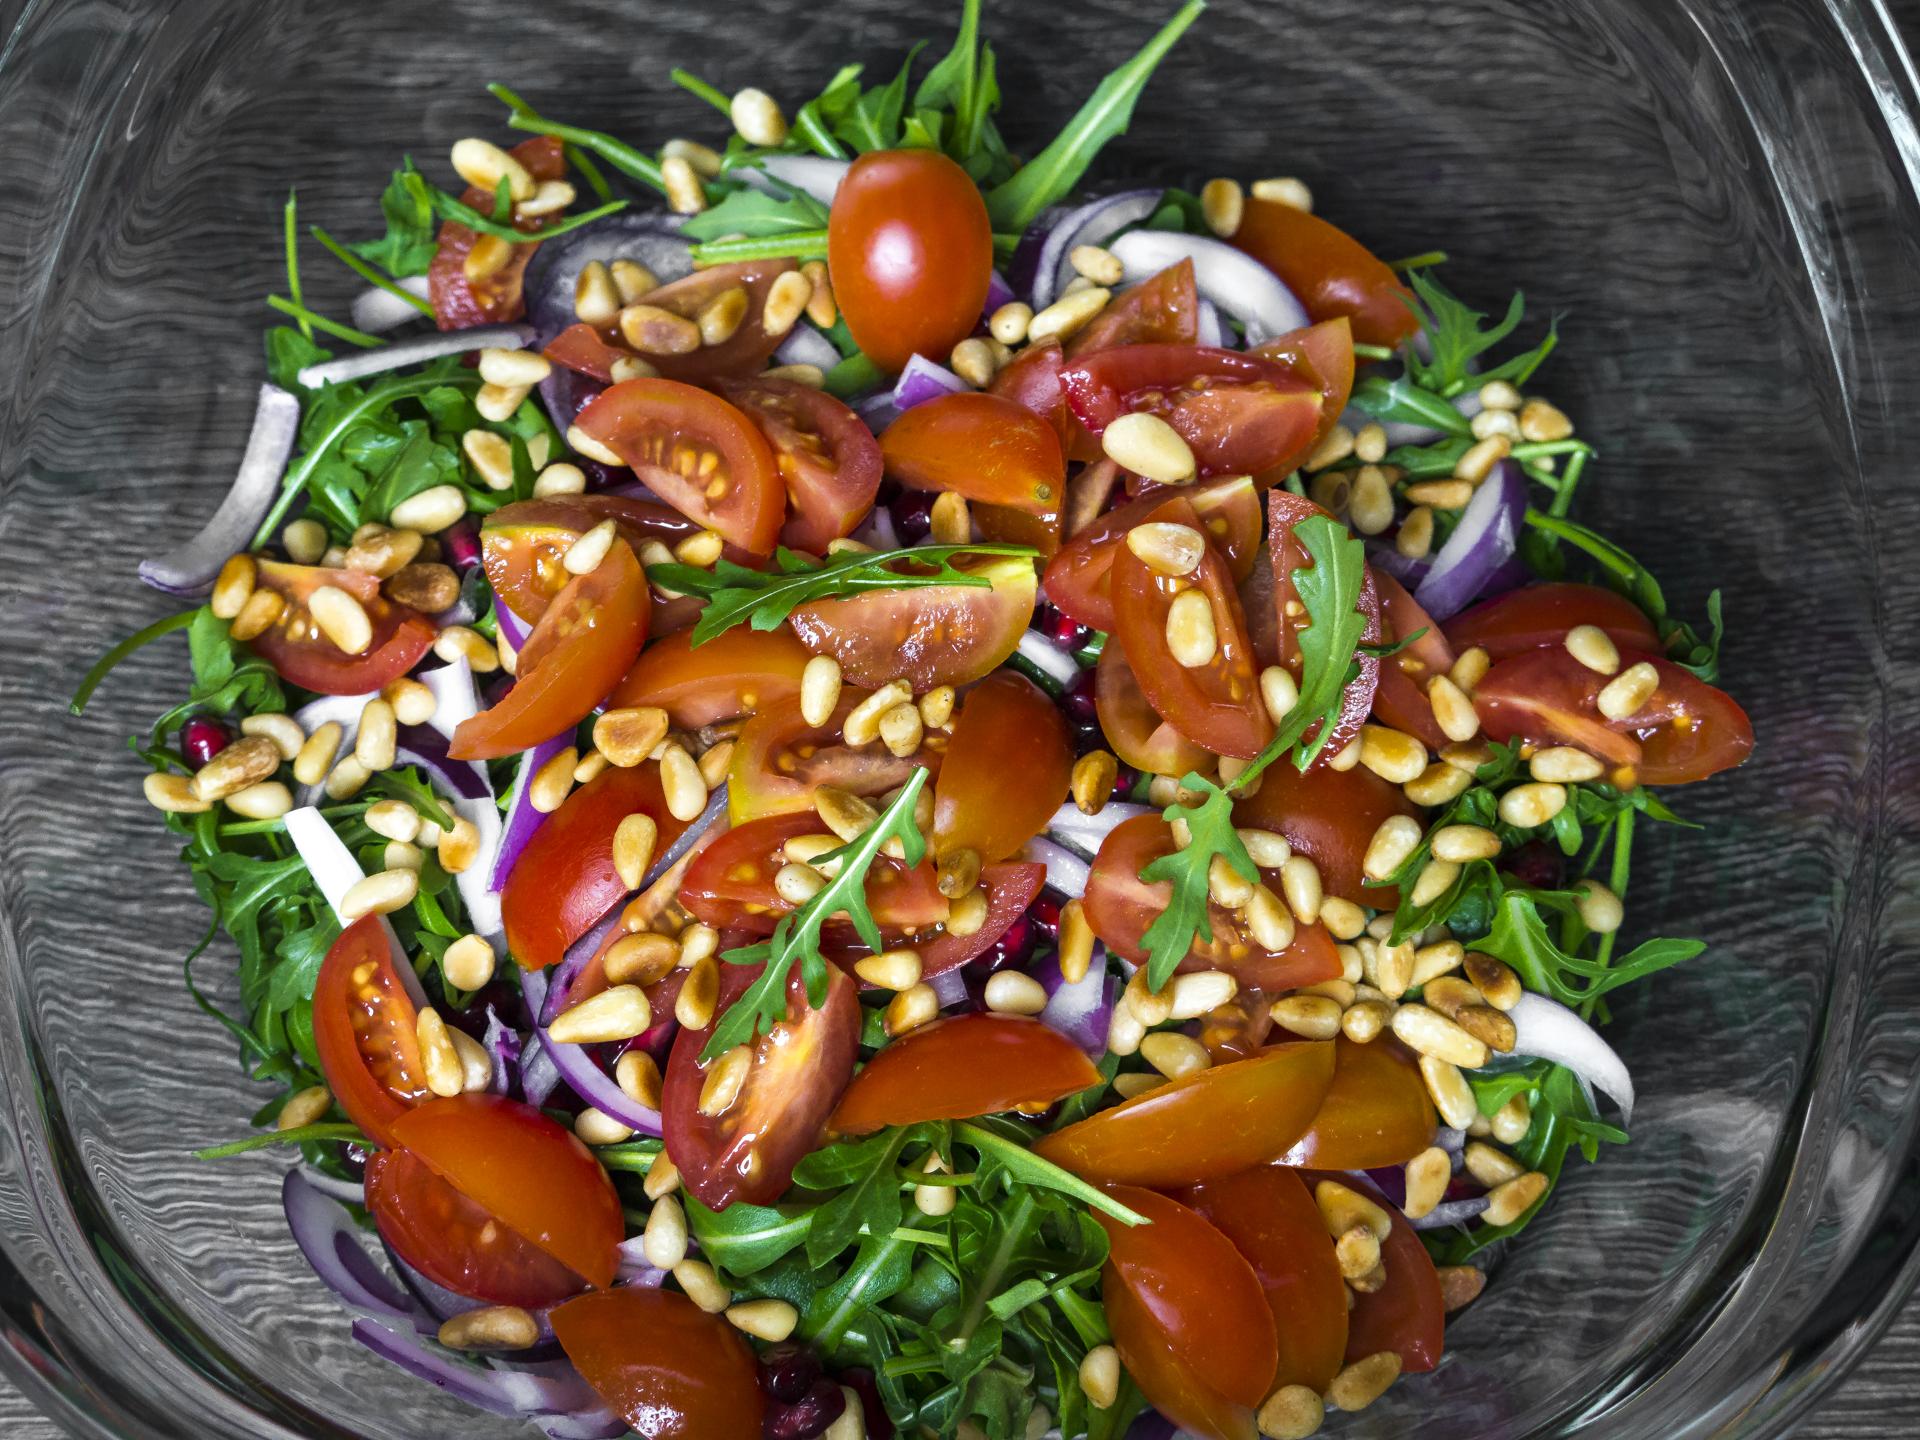 der rucola salat die perfekte beilage zu eurem low carb essen. Black Bedroom Furniture Sets. Home Design Ideas